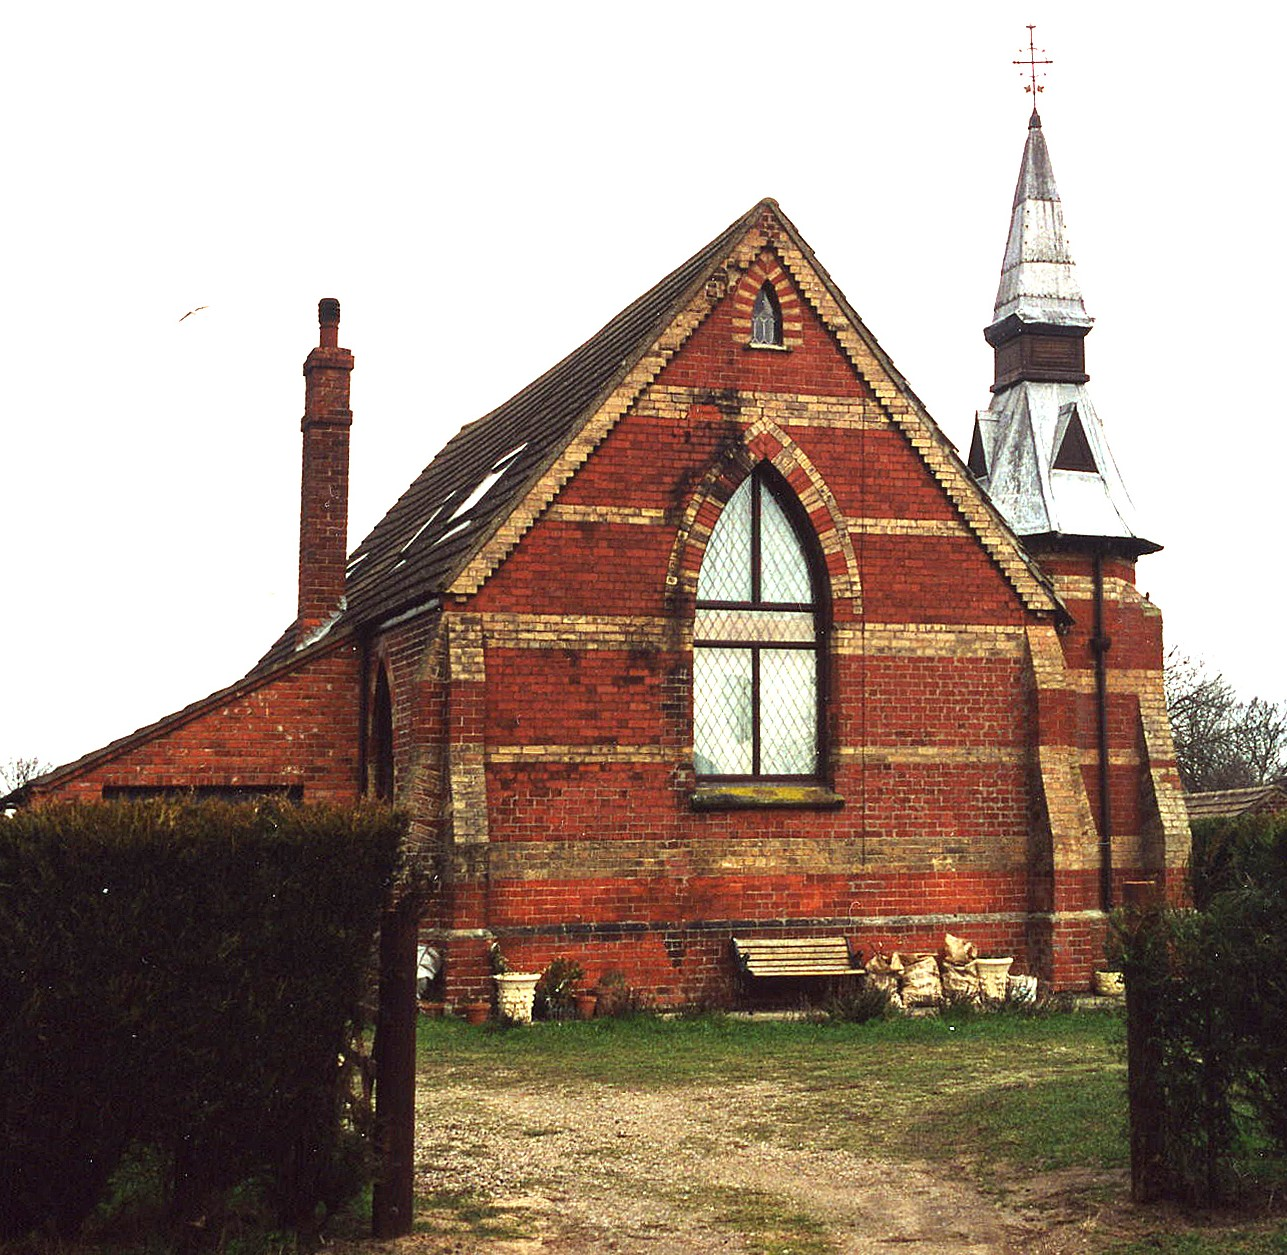 St. Botolph